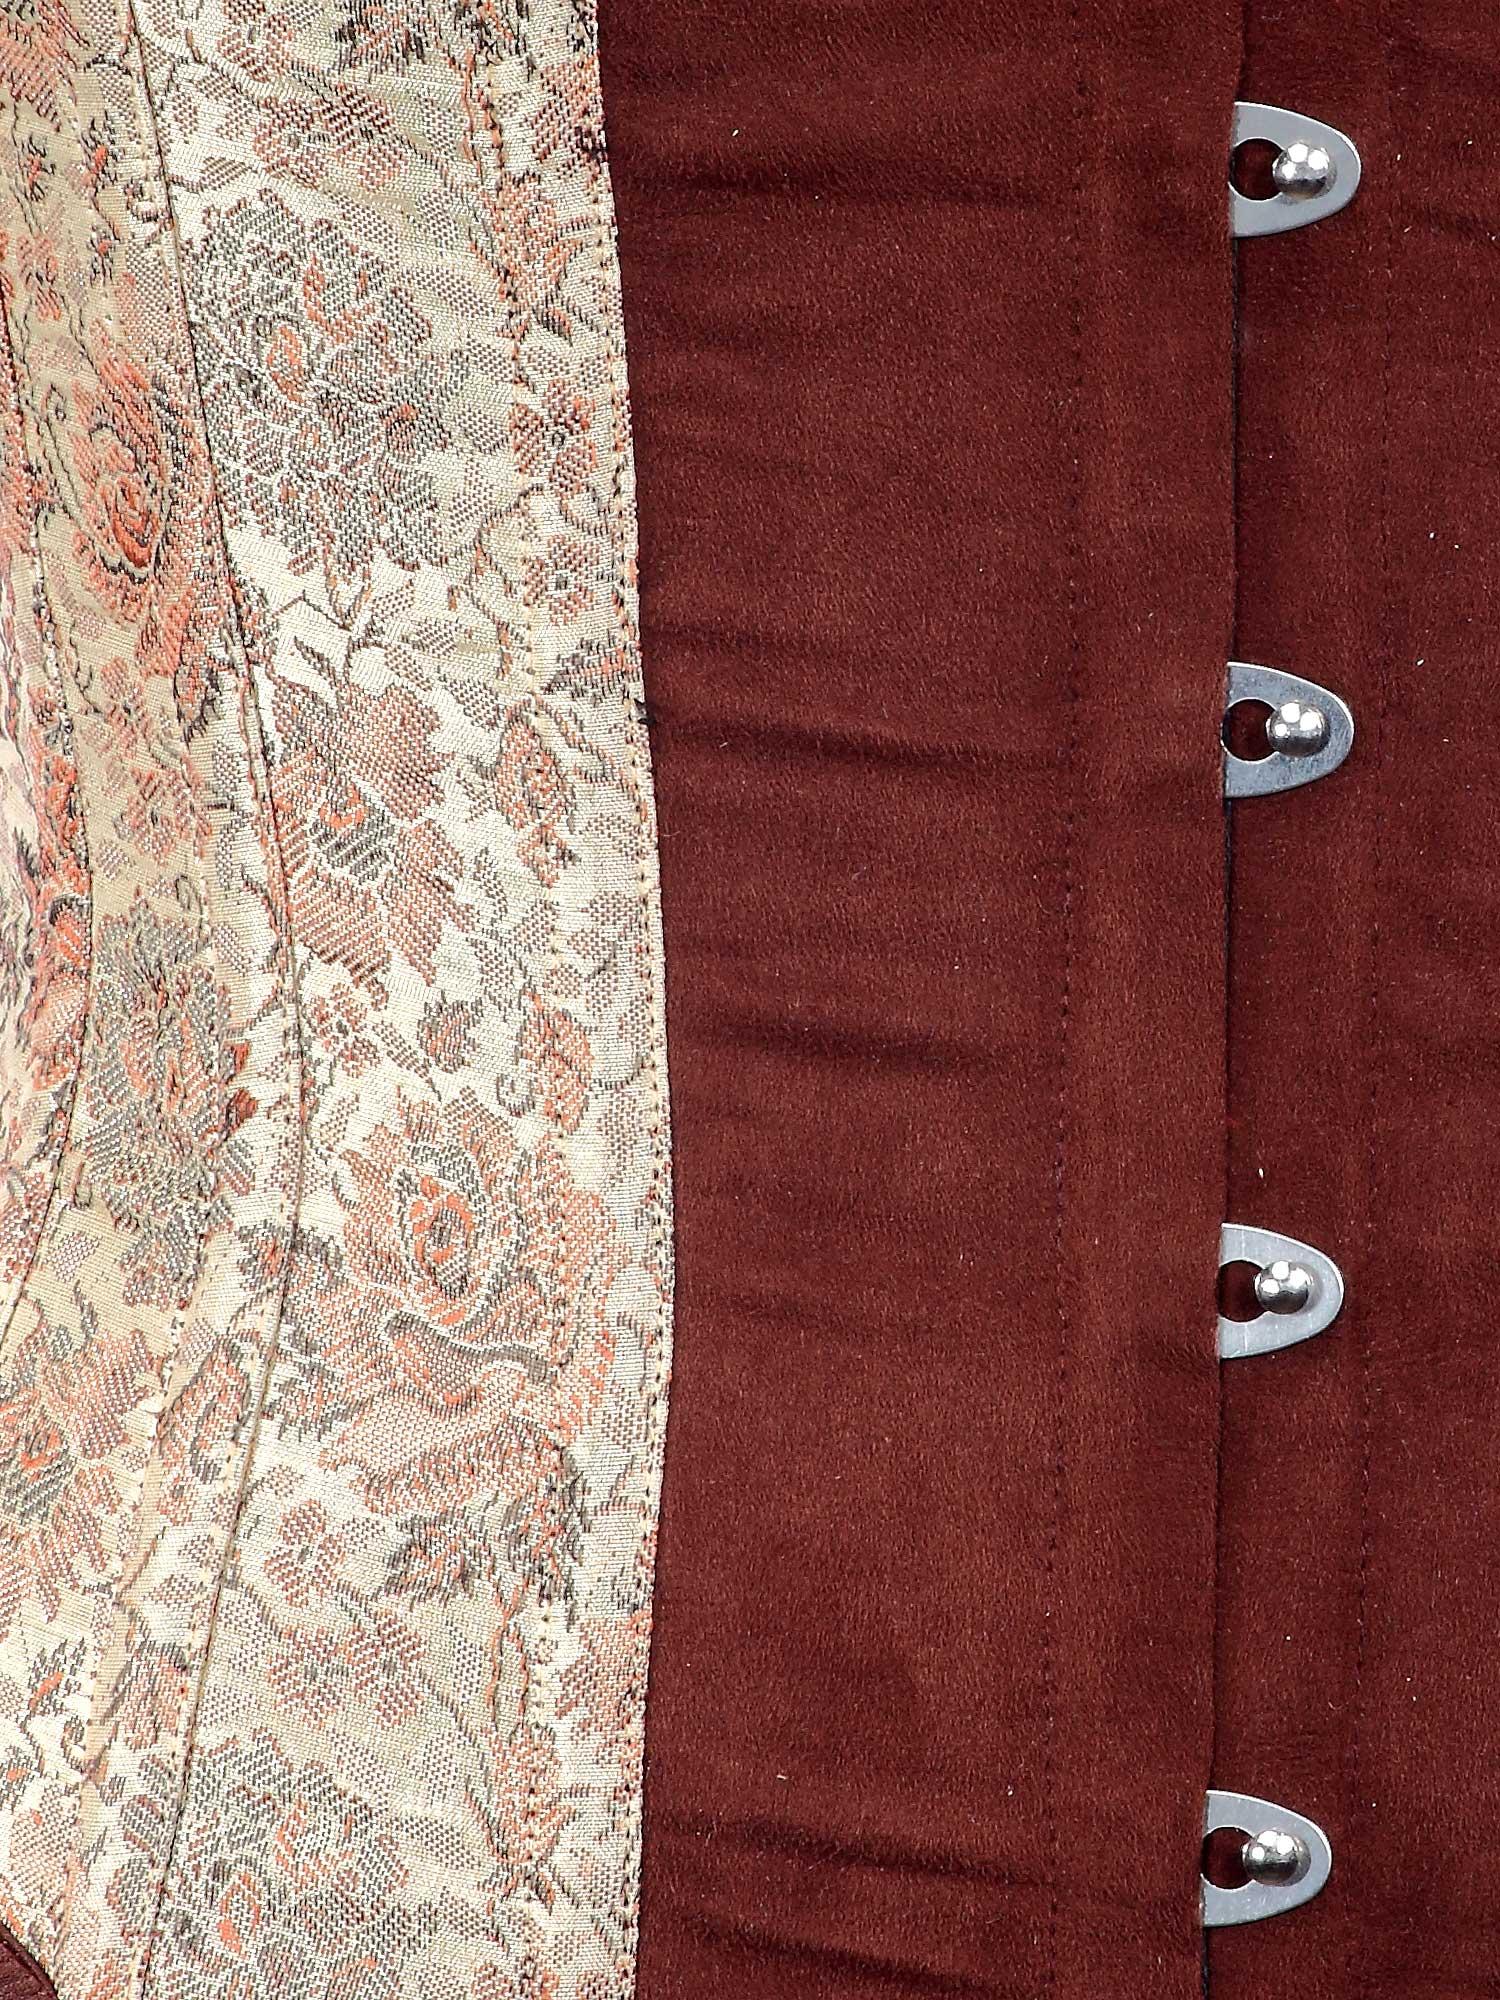 chocolate_suede_cream_brocade_fabric_steel_boning_underbust_corset_waist_cincher_bustier_bustiers_and_corsets_2.jpg